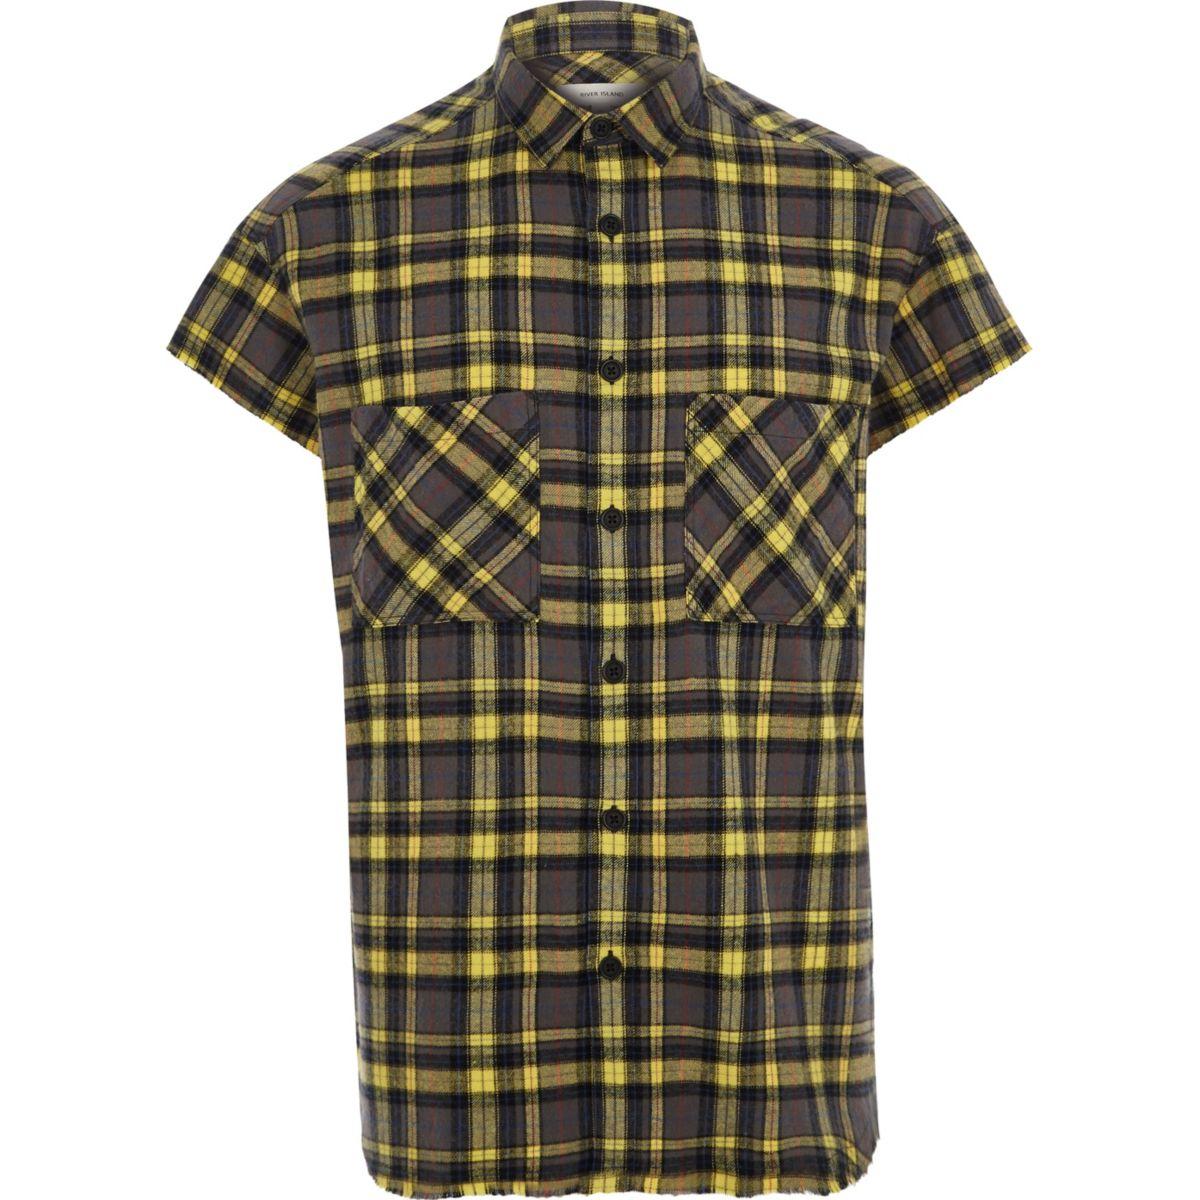 Yellow short sleeve check shirt